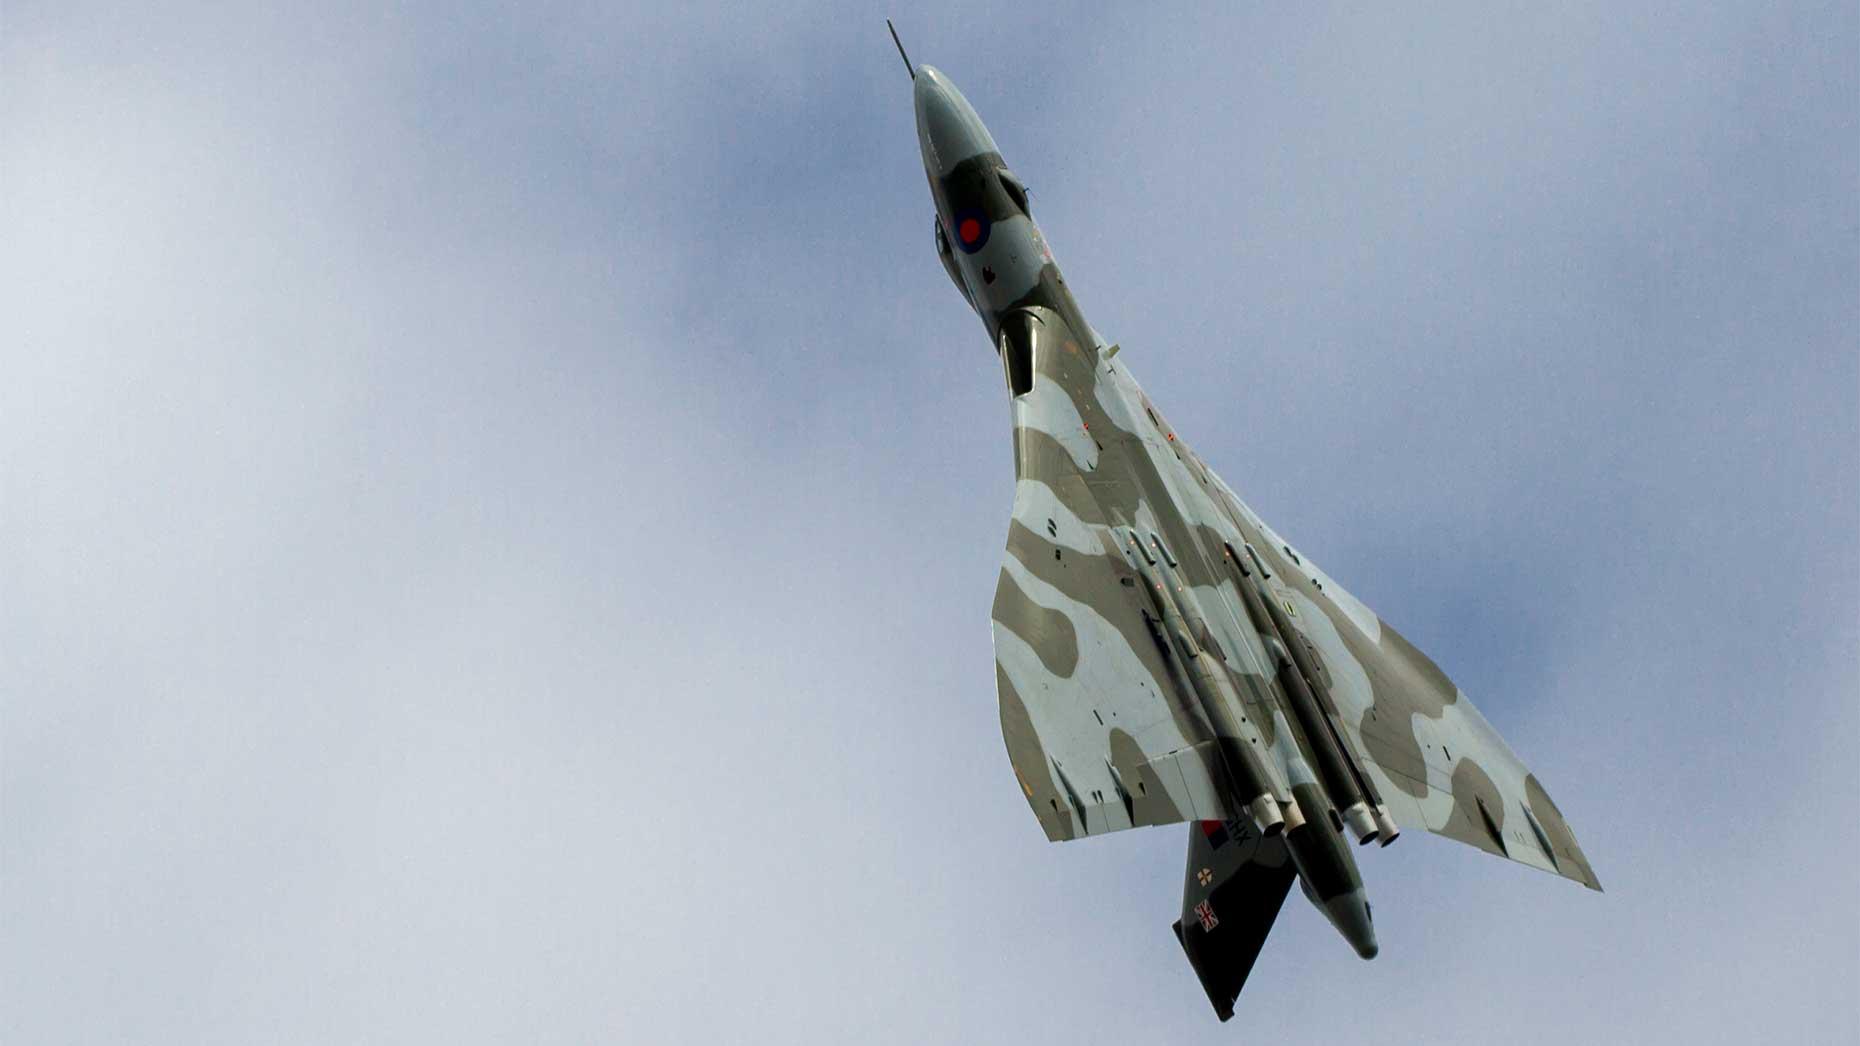 The Vulcan over RAF Scampton. Photo: Sean Strange